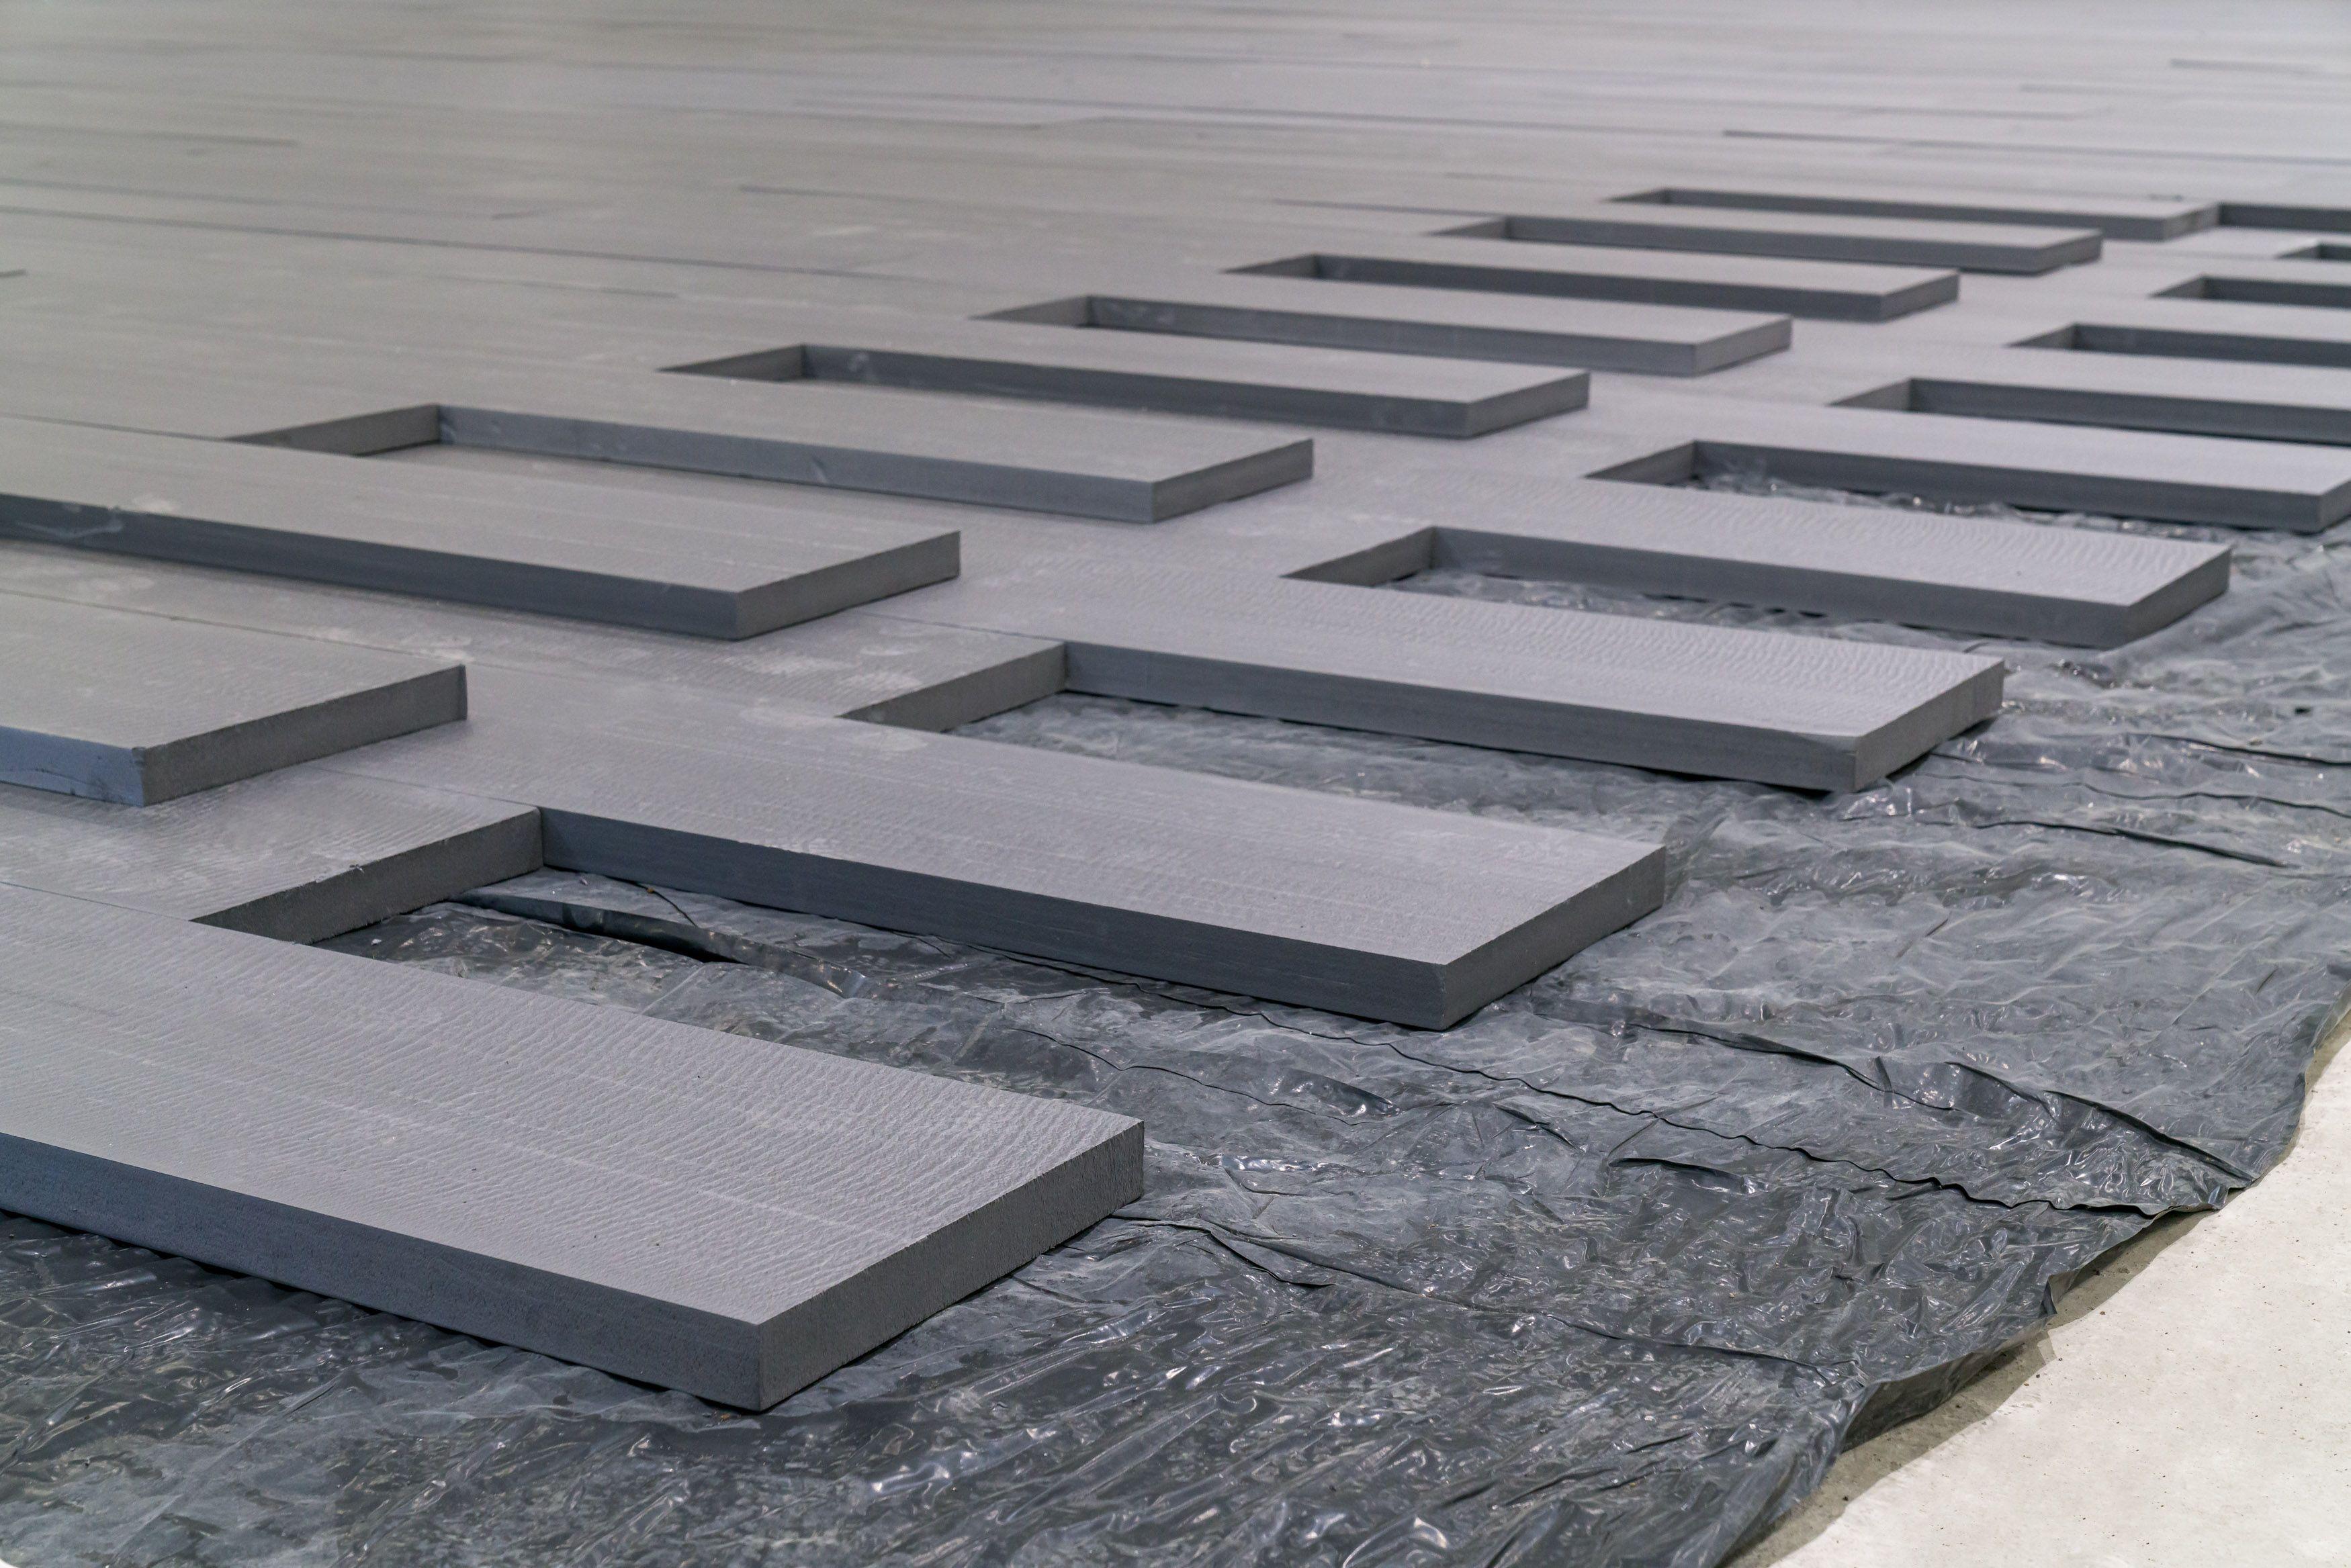 50mm Ravatherm Xps X 300 Sb Multi Purpose Extruded Polystyrene Board In 2020 Polystyrene Polystyrene Board Home Insulation